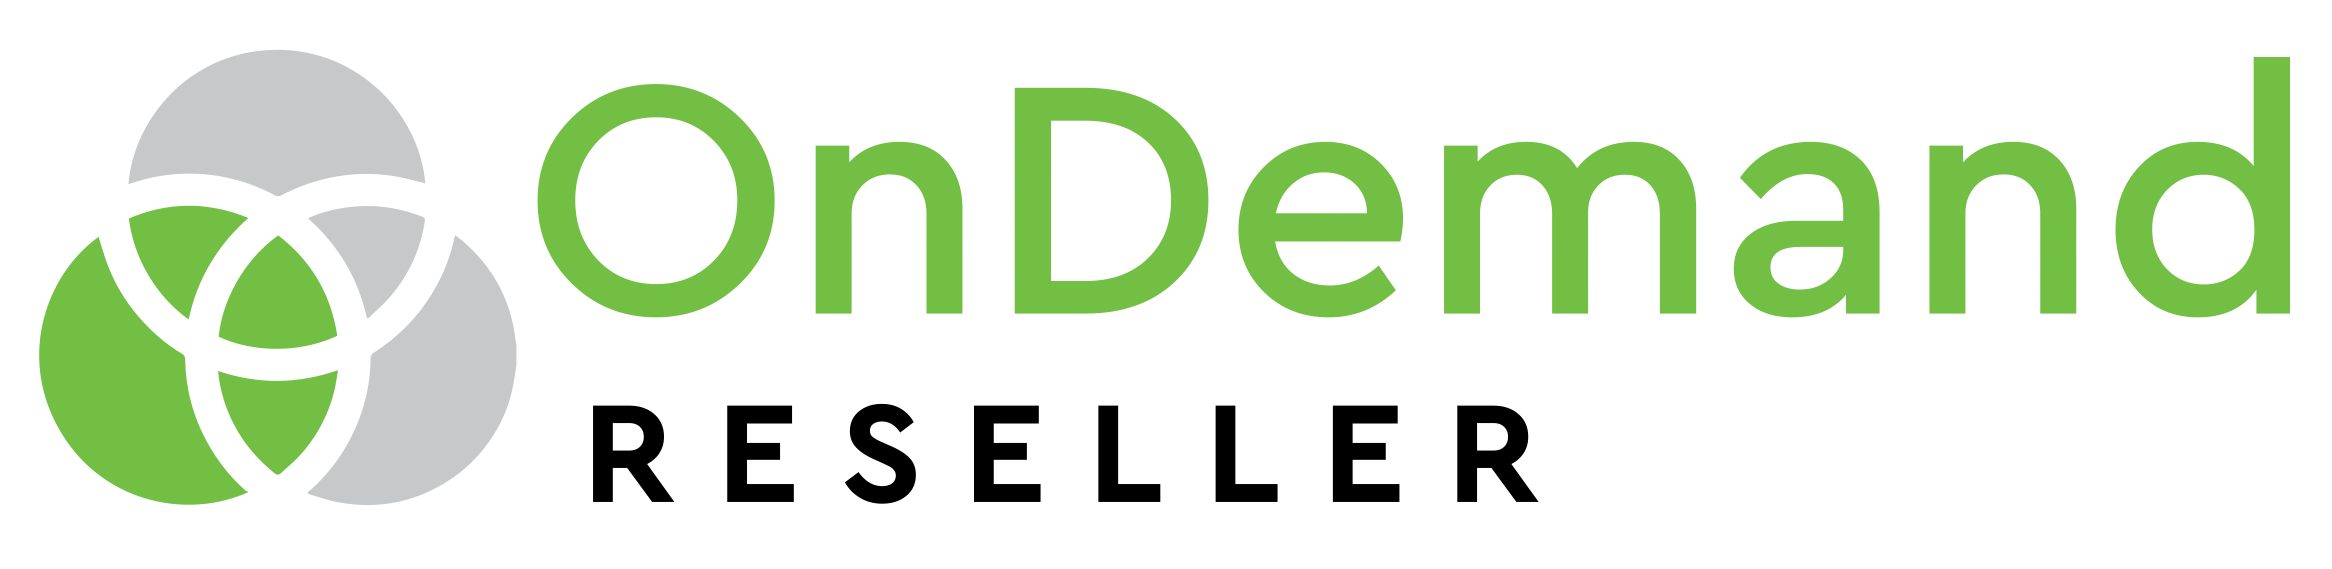 OnDemand Reseller Logo